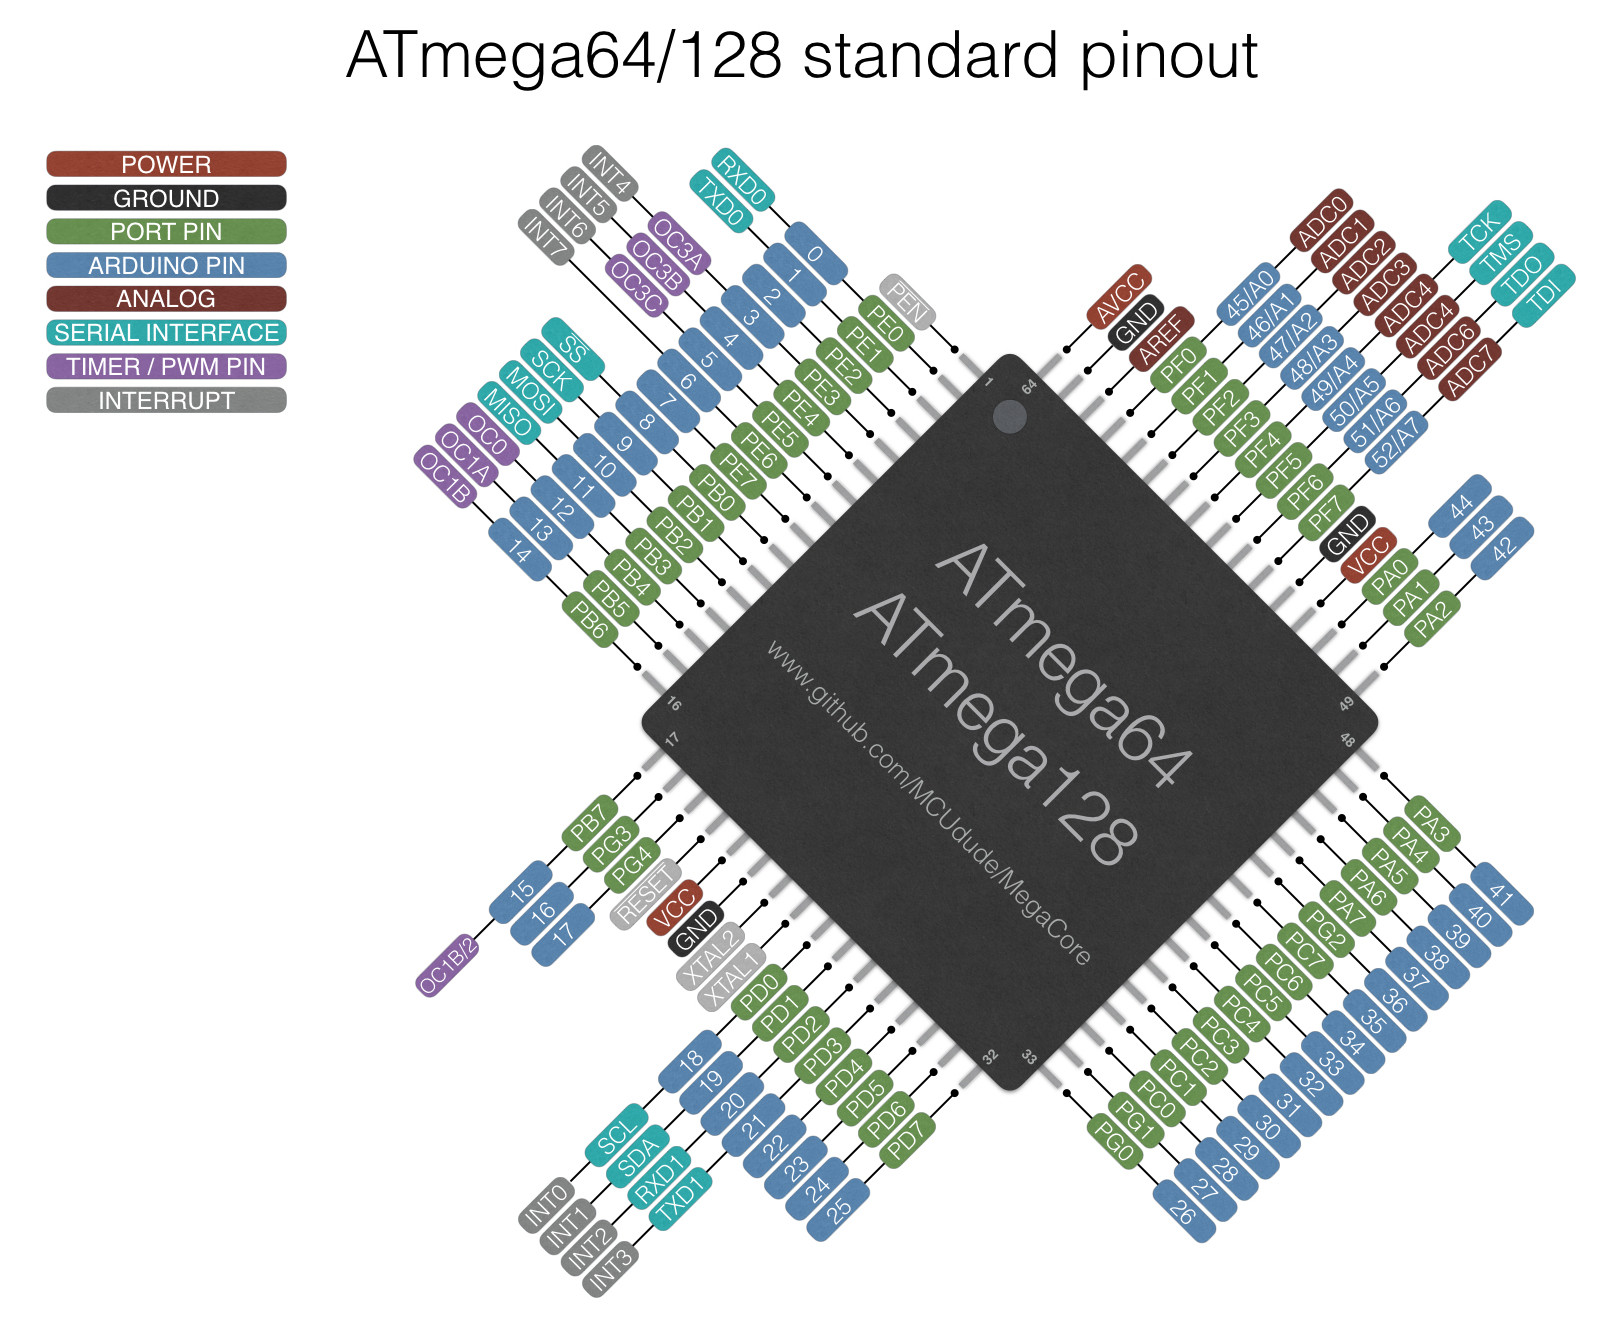 ATmega64_128_pinout.jpg